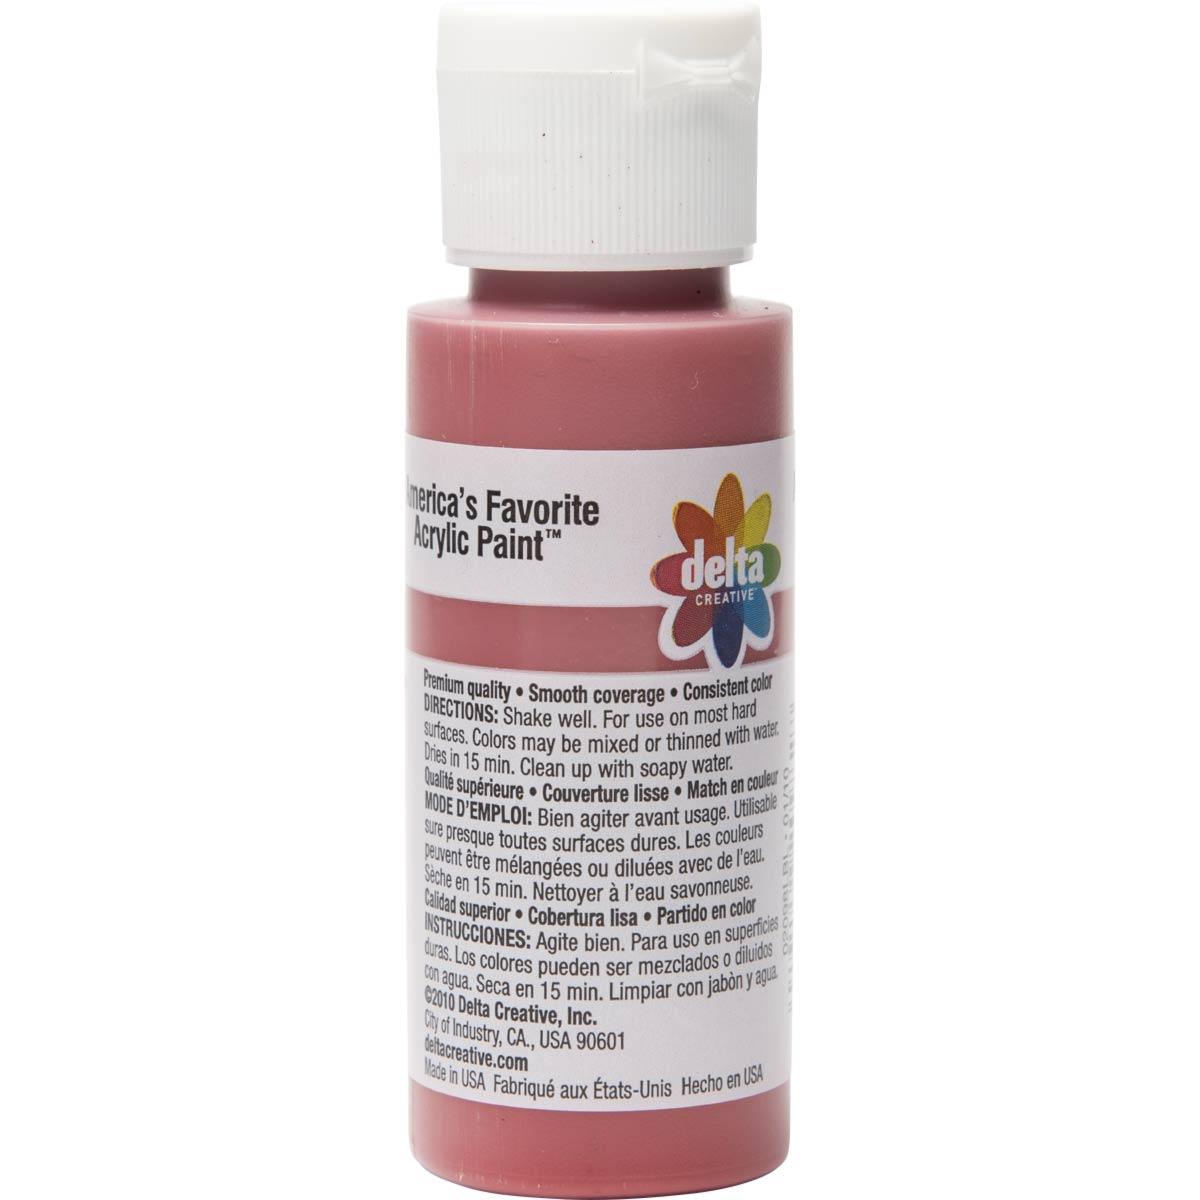 Delta Ceramcoat Acrylic Paint - Tomato Spice, 2 oz. - 020980202W